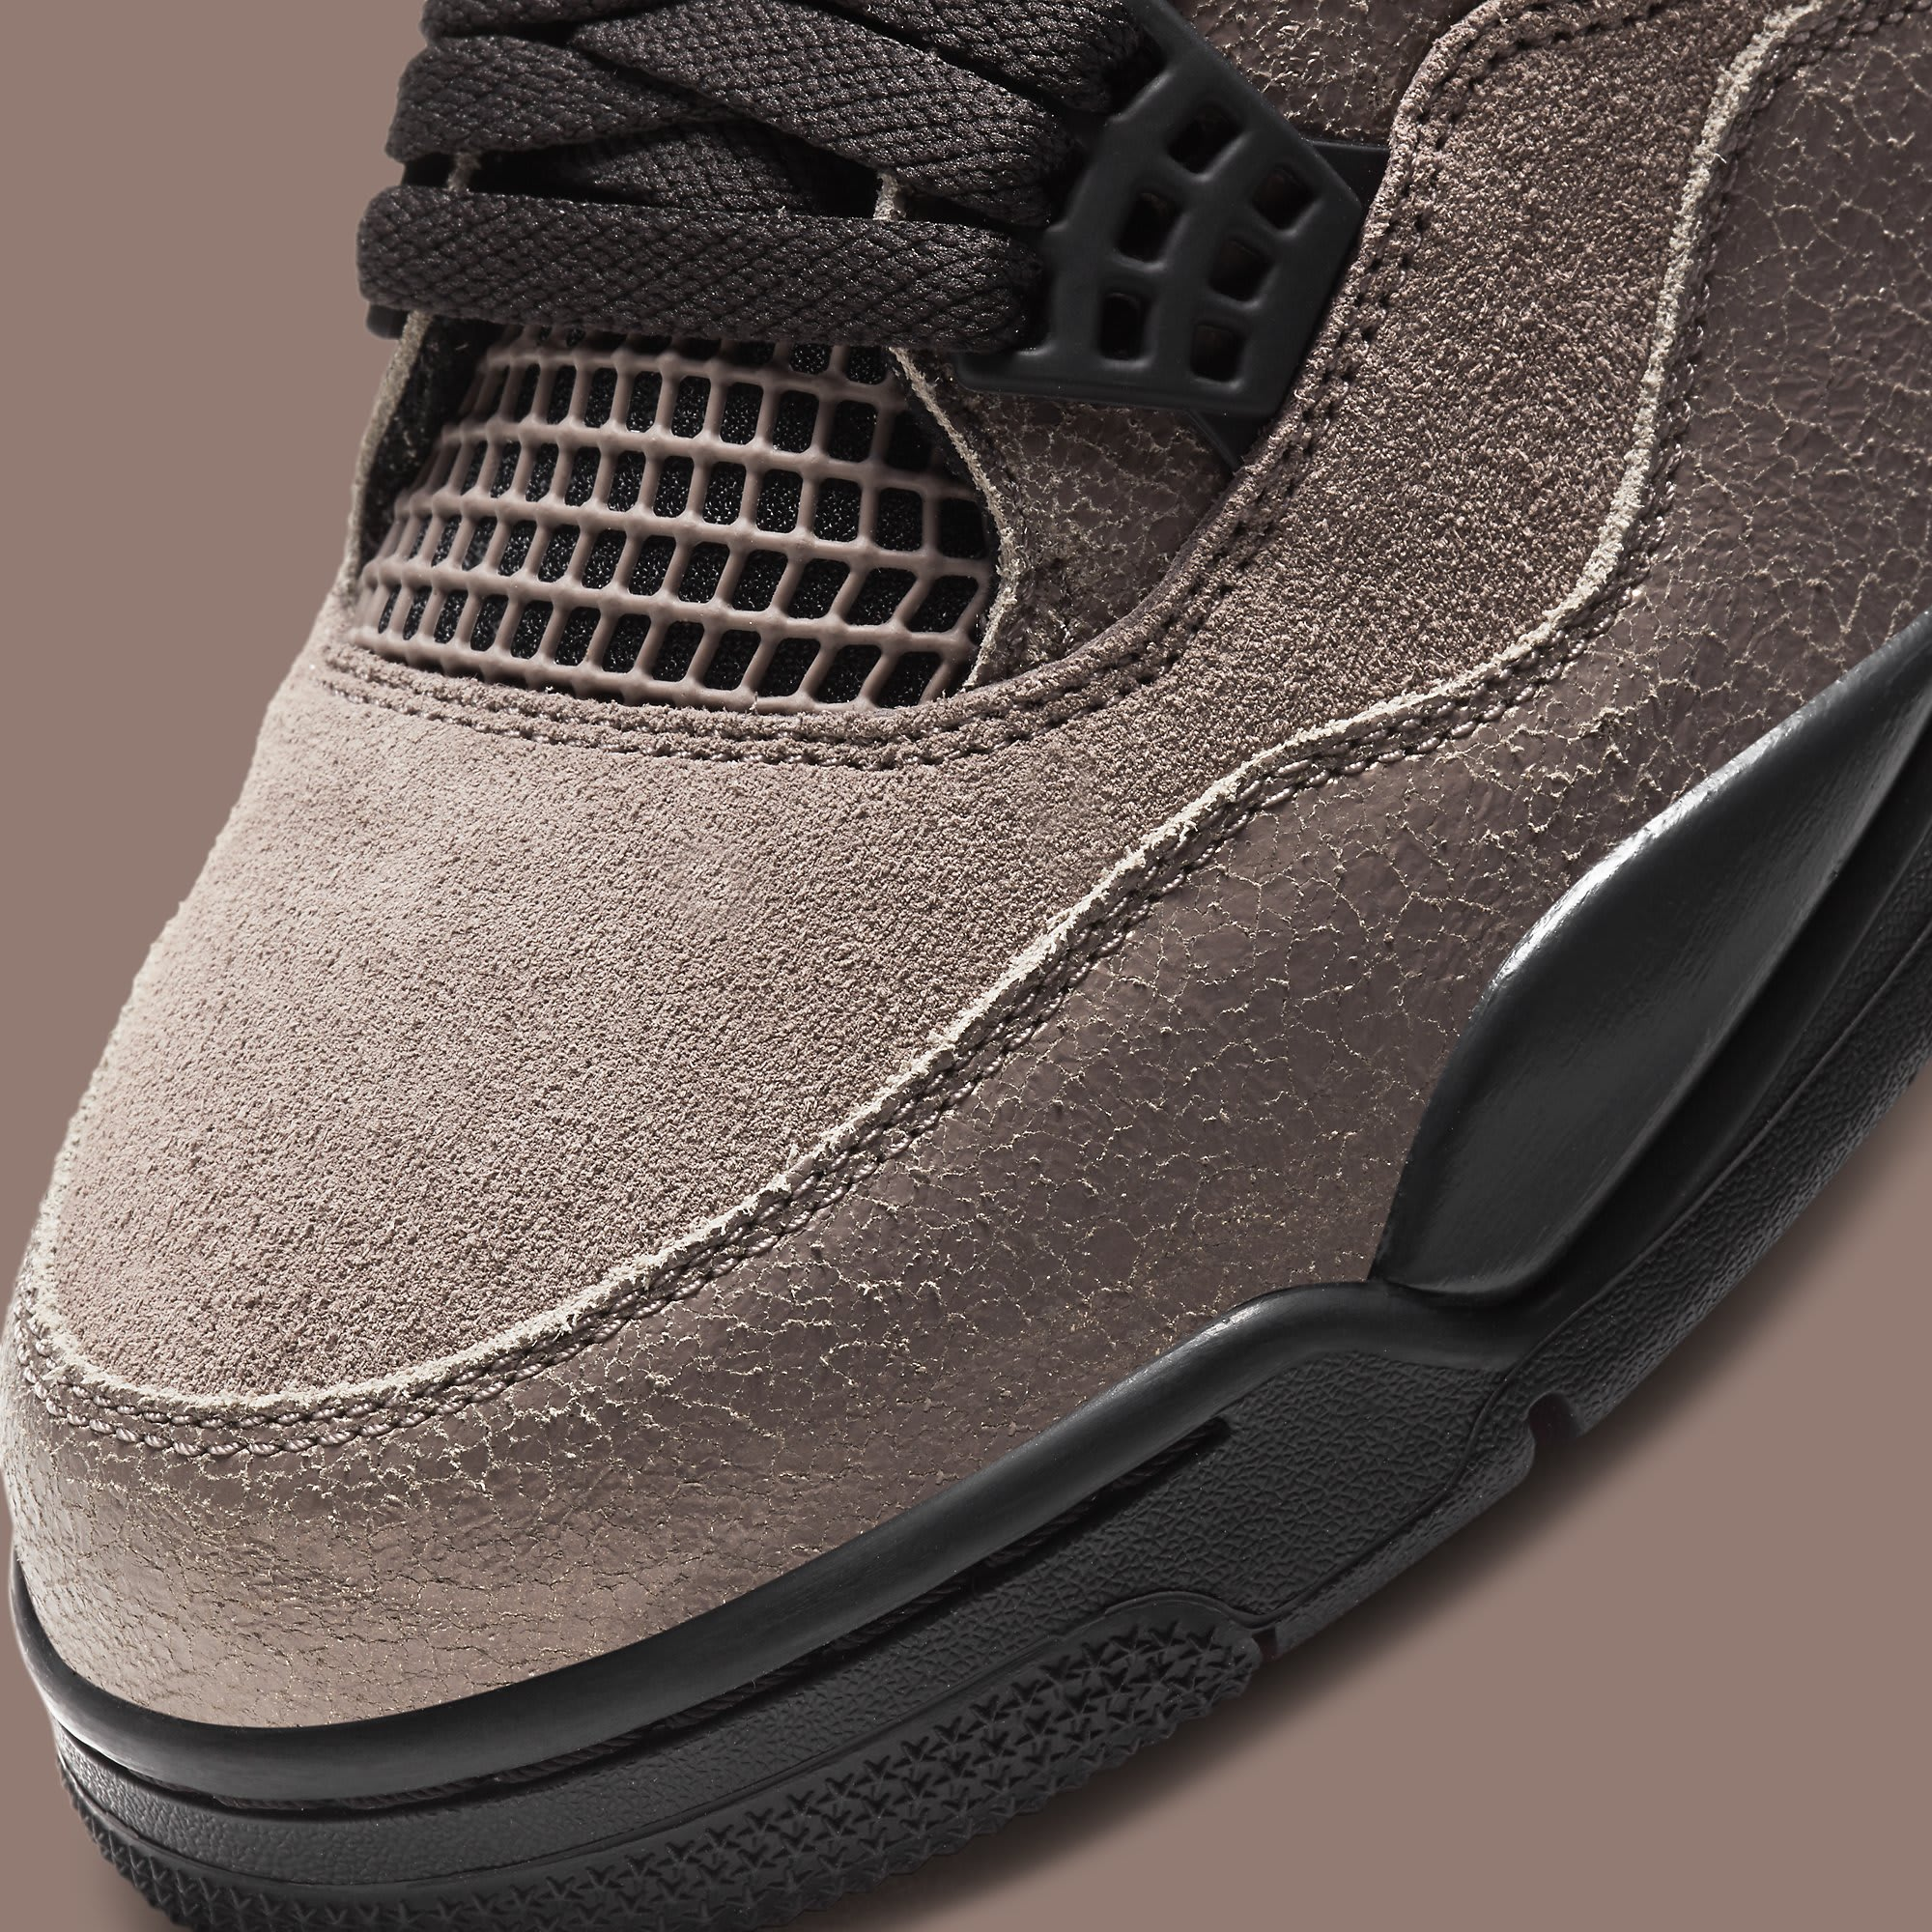 Air Jordan 4 IV Taupe Haze Release Date DB0732-200 Toe Detail